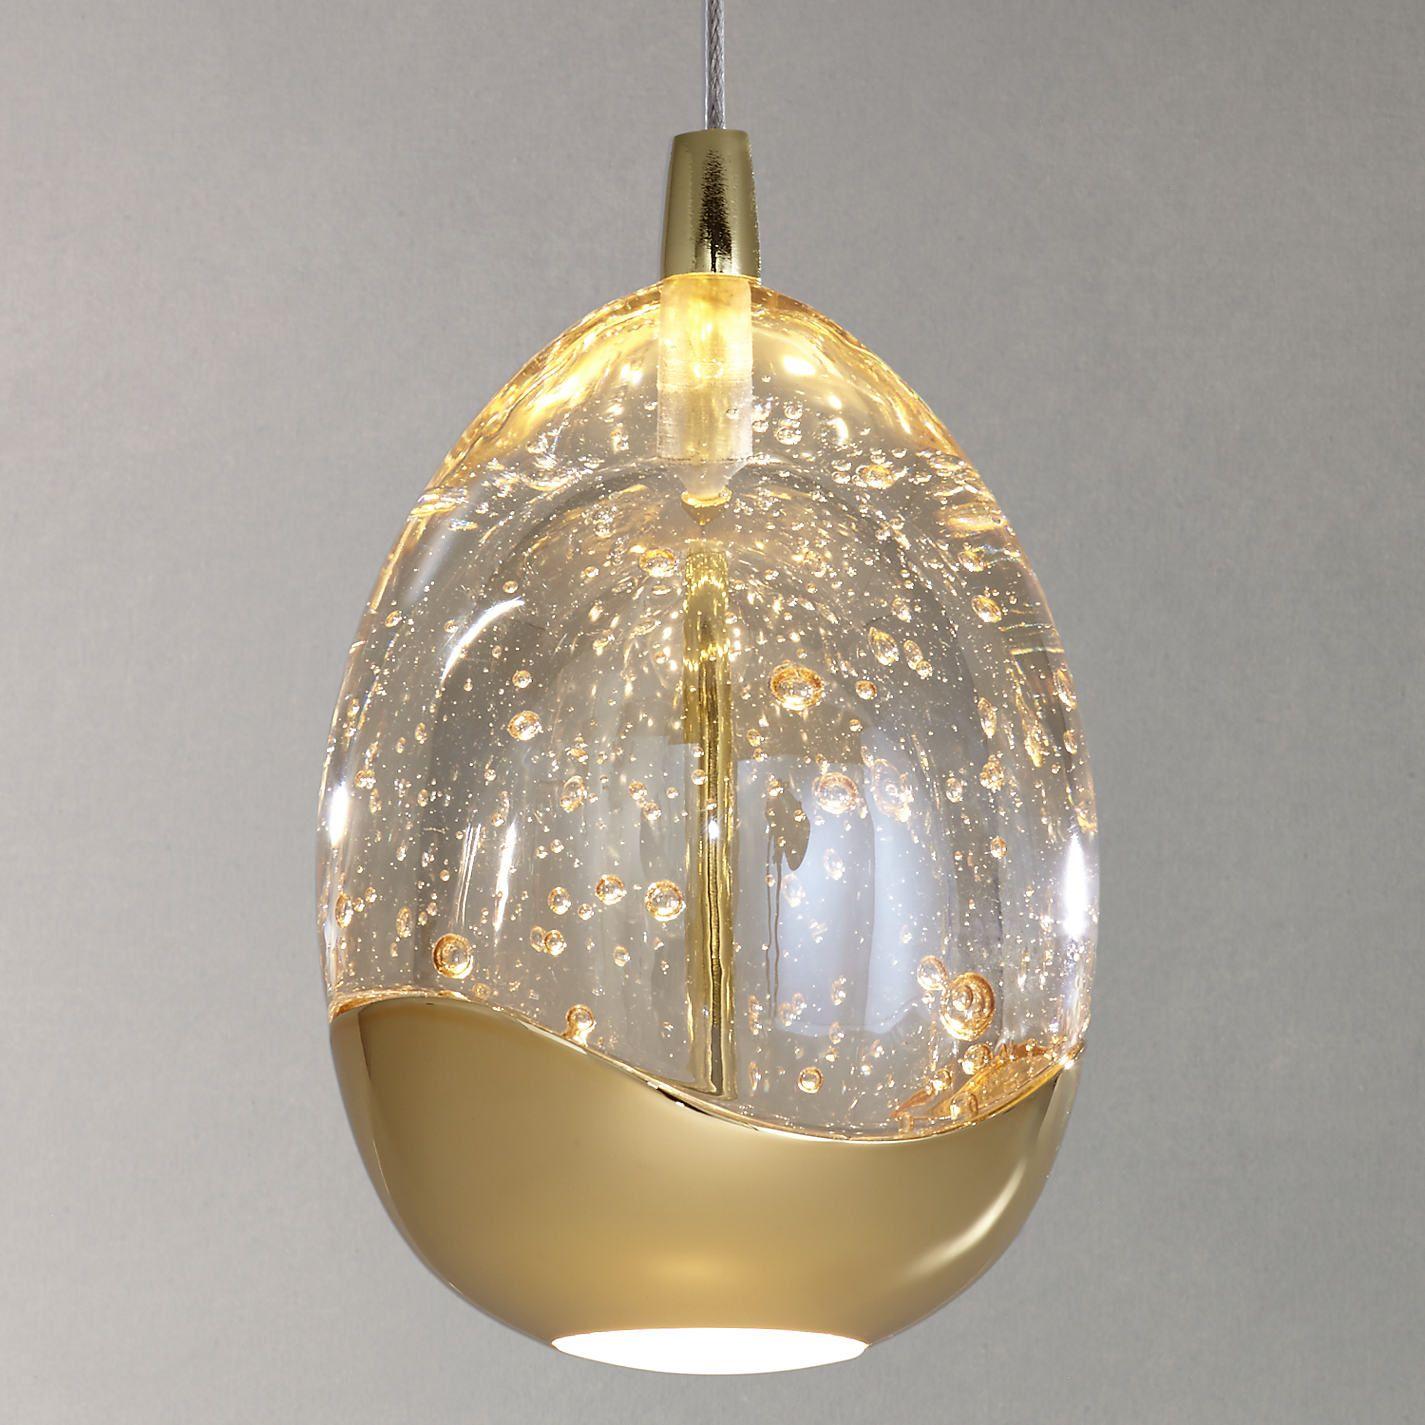 John lewis droplet led single pendant ceiling light clearsatin buy john lewis single droplet led pendant ceiling light john lewis aloadofball Images